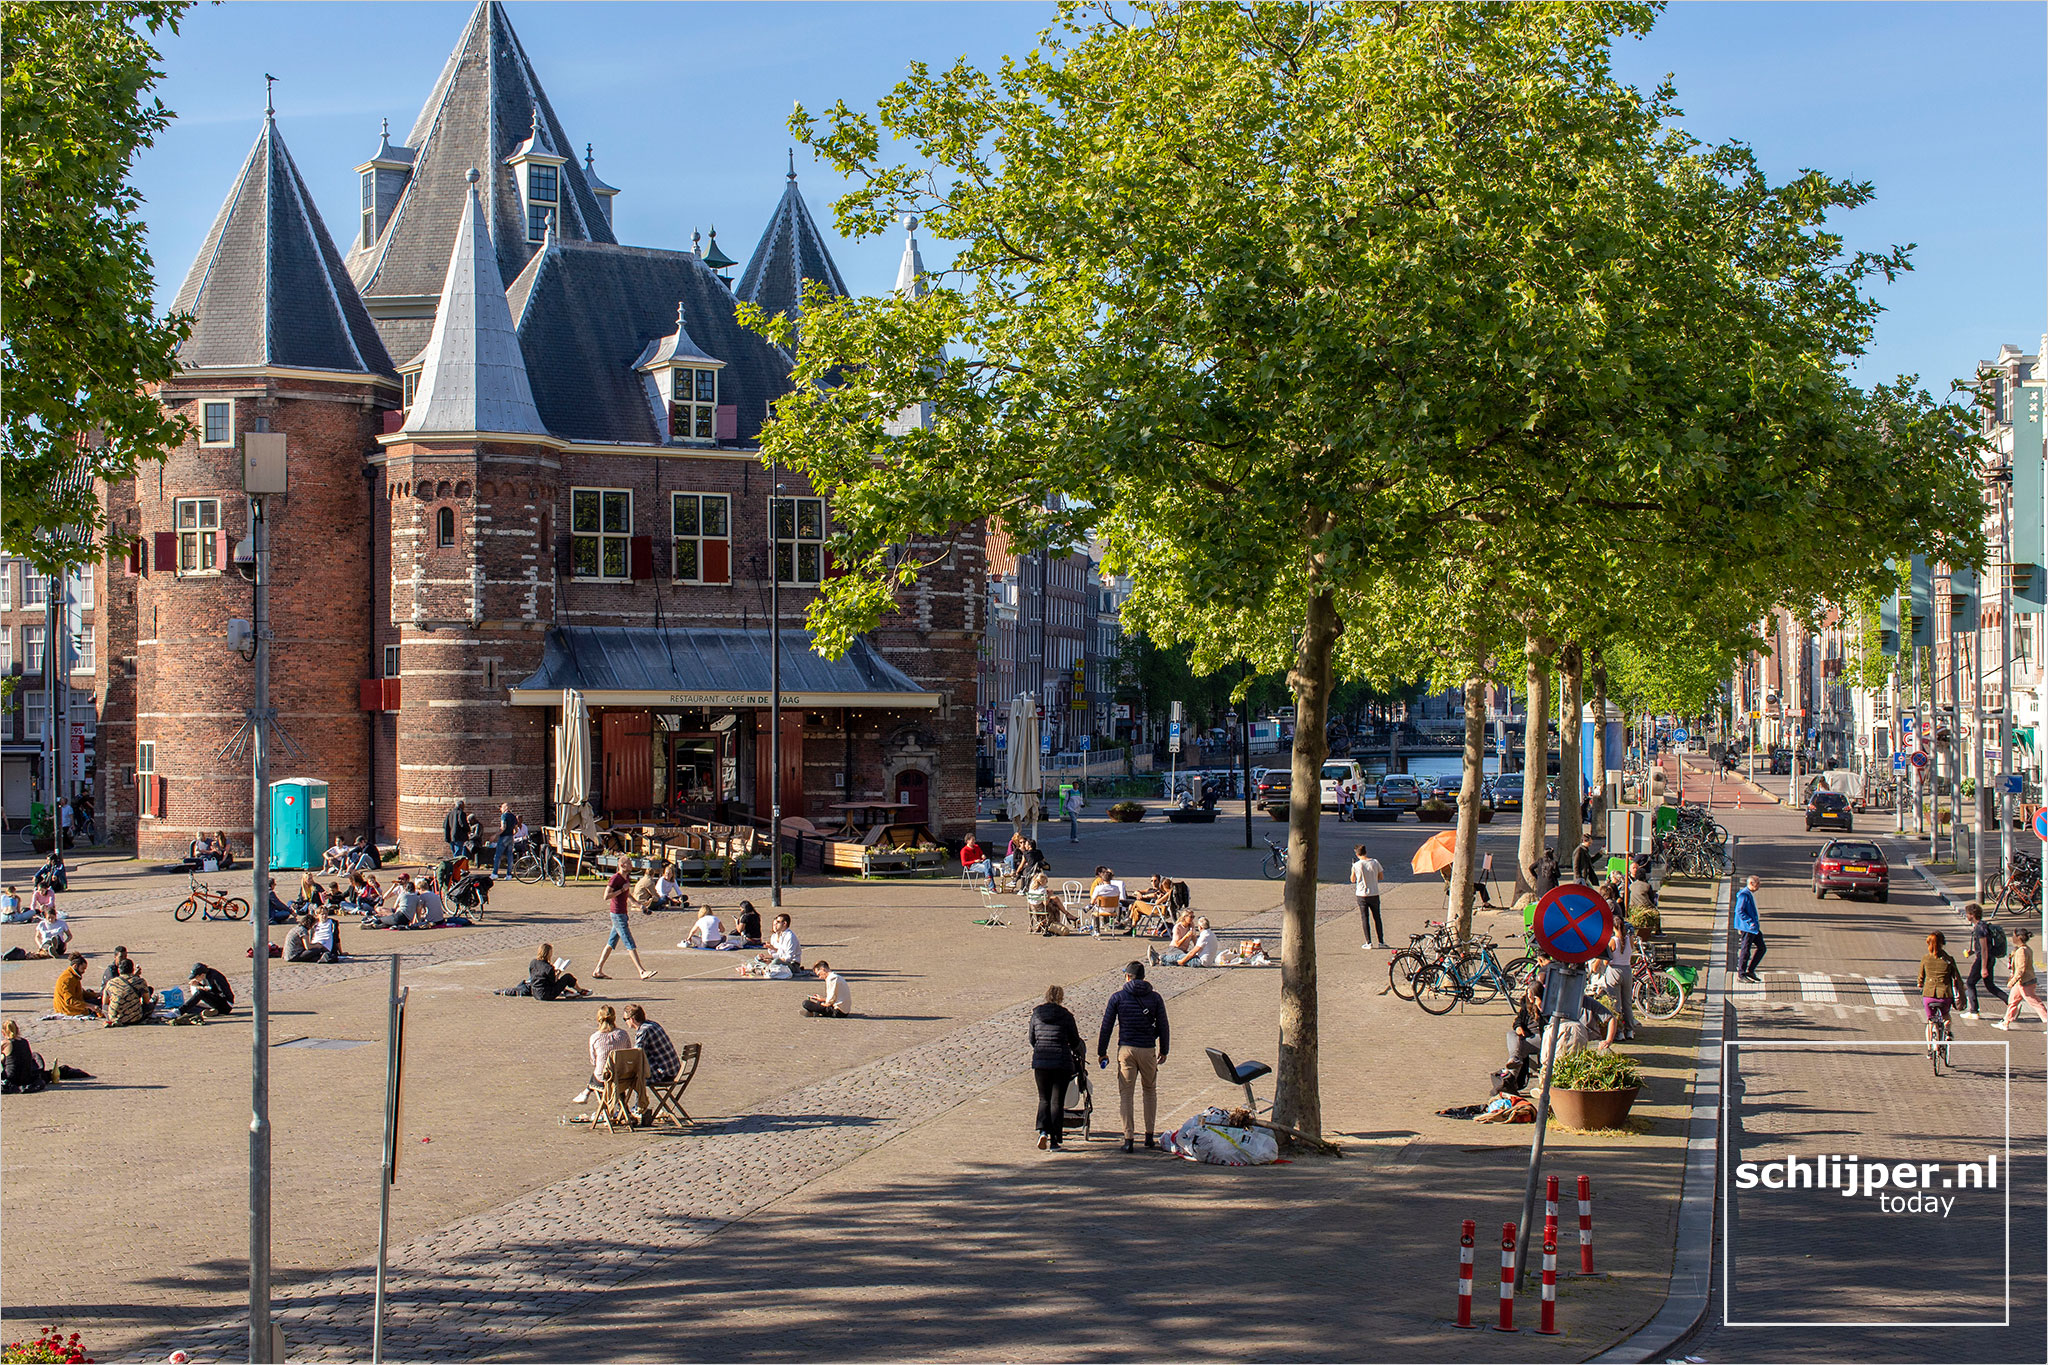 Nederland, Amsterdam, 17 mei 2020